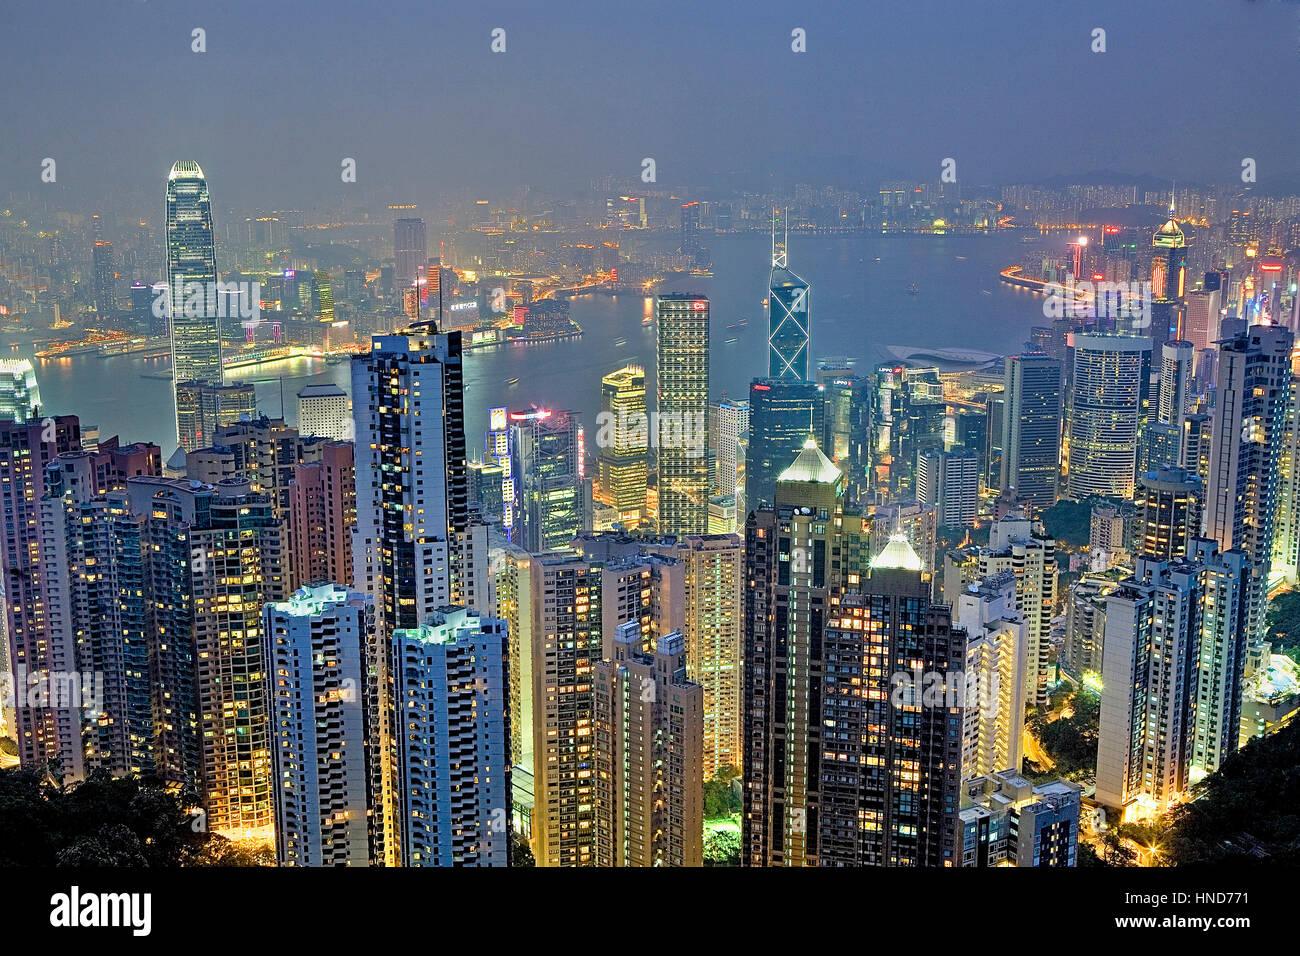 Night, Cityscape from the Peak,Hong Kong, China - Stock Image